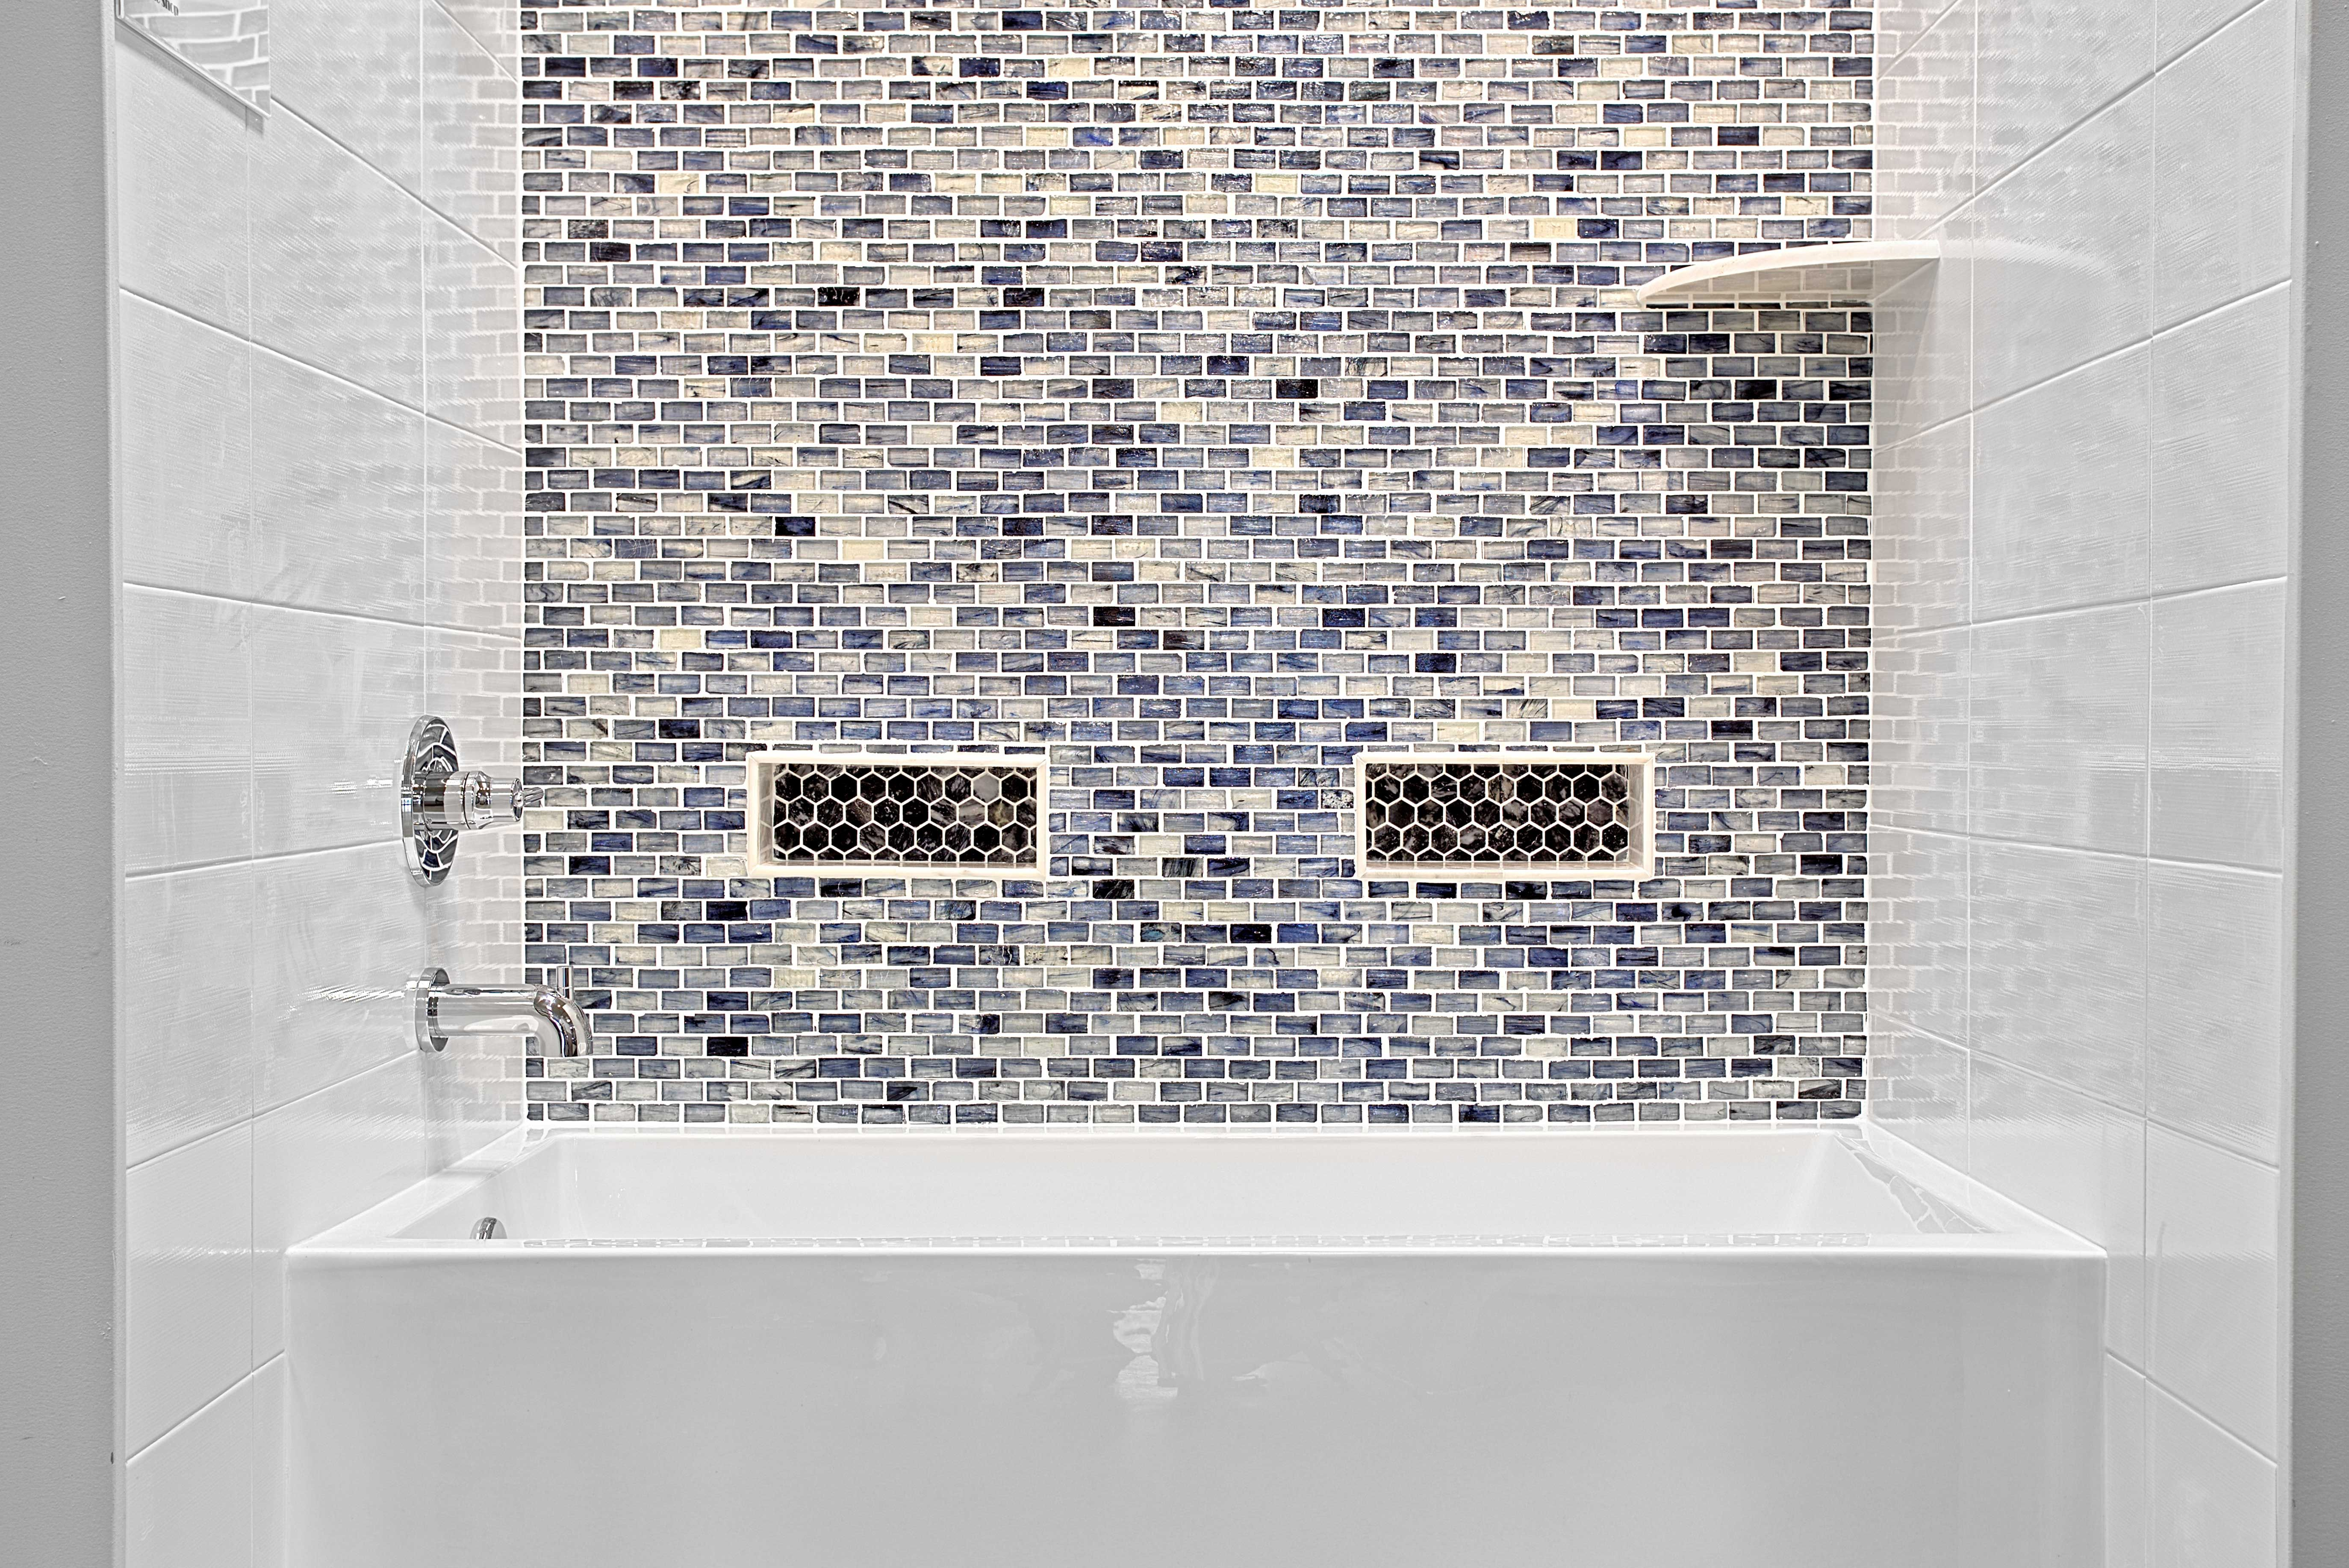 Bathroom Mosaic Wall Tile Blue Twilight Brick Glass Mosaic Tile